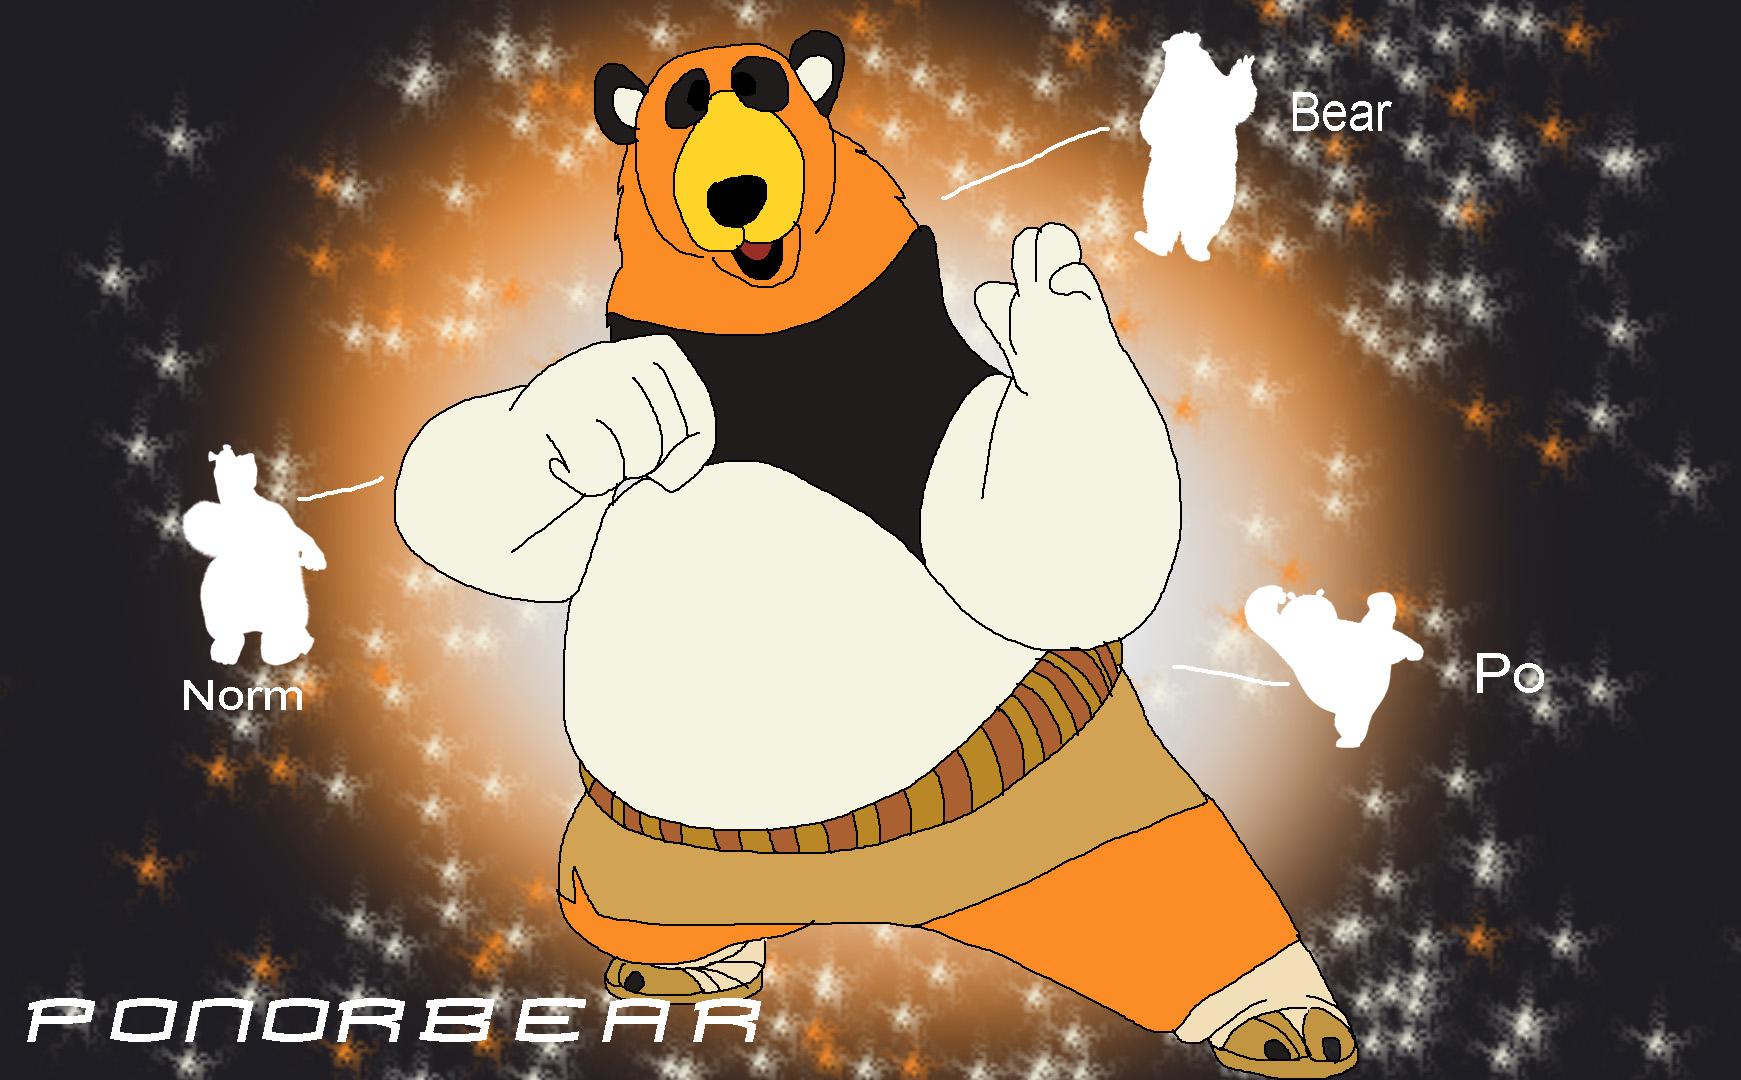 Fusion - Ponorbear by Rainbow-Dash-Rockz